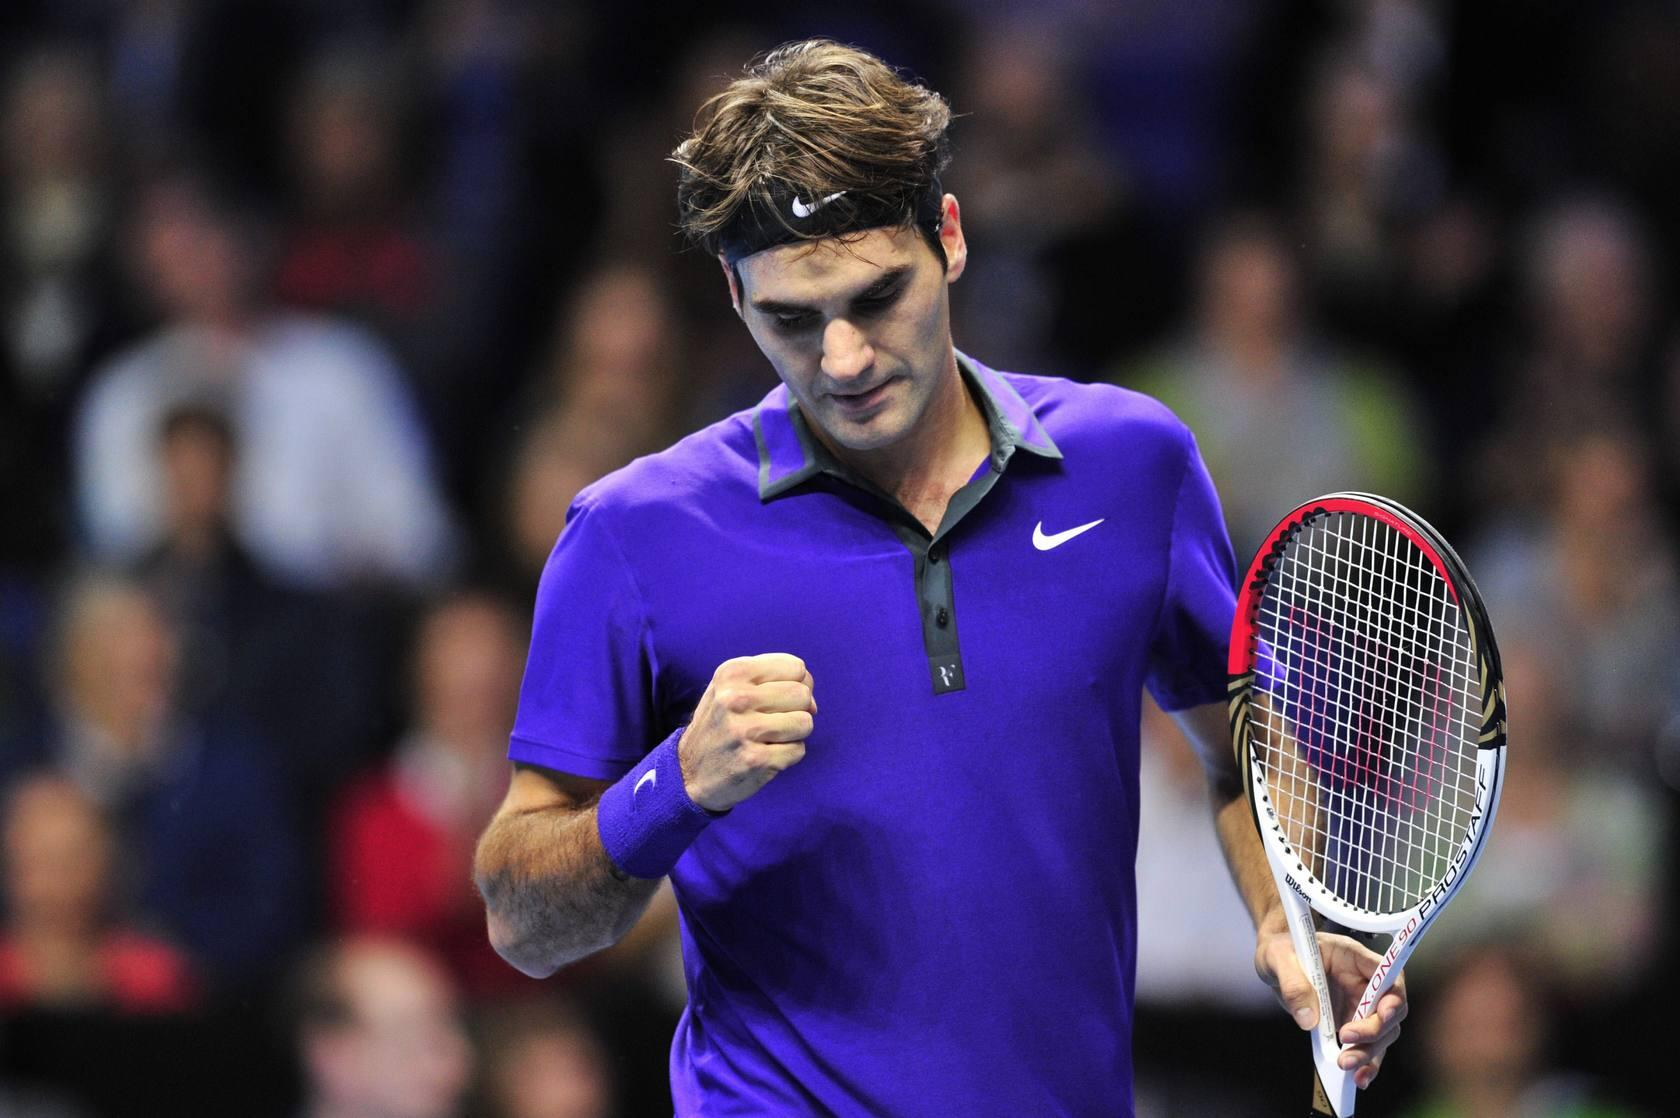 Federer derrota a David Ferrer en la Copa de Maestros